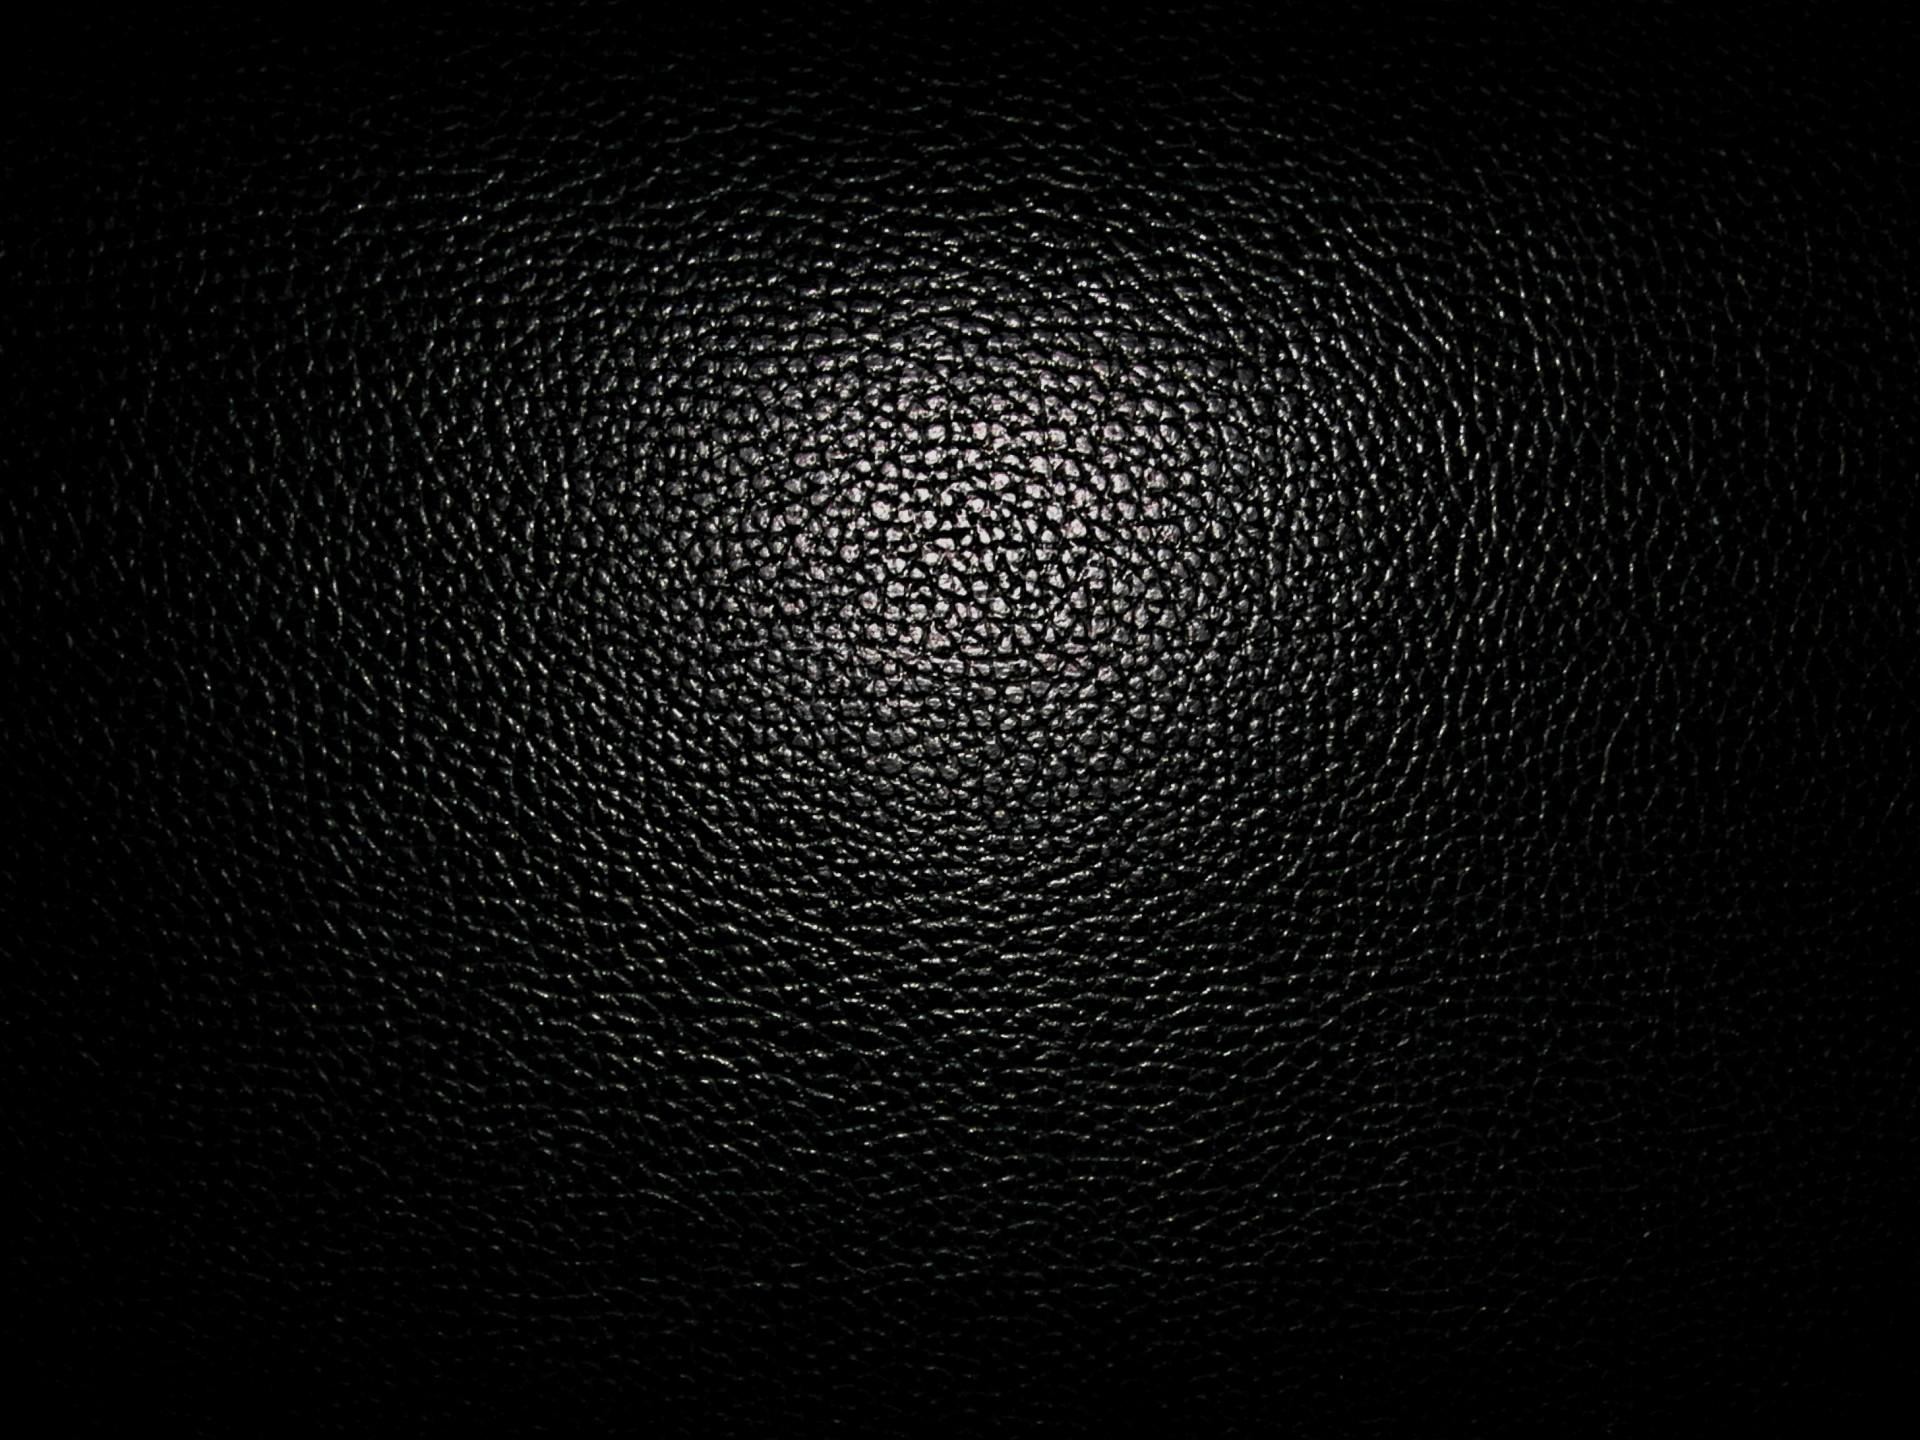 Black Leather Texture Free Stock Photo Public Domain